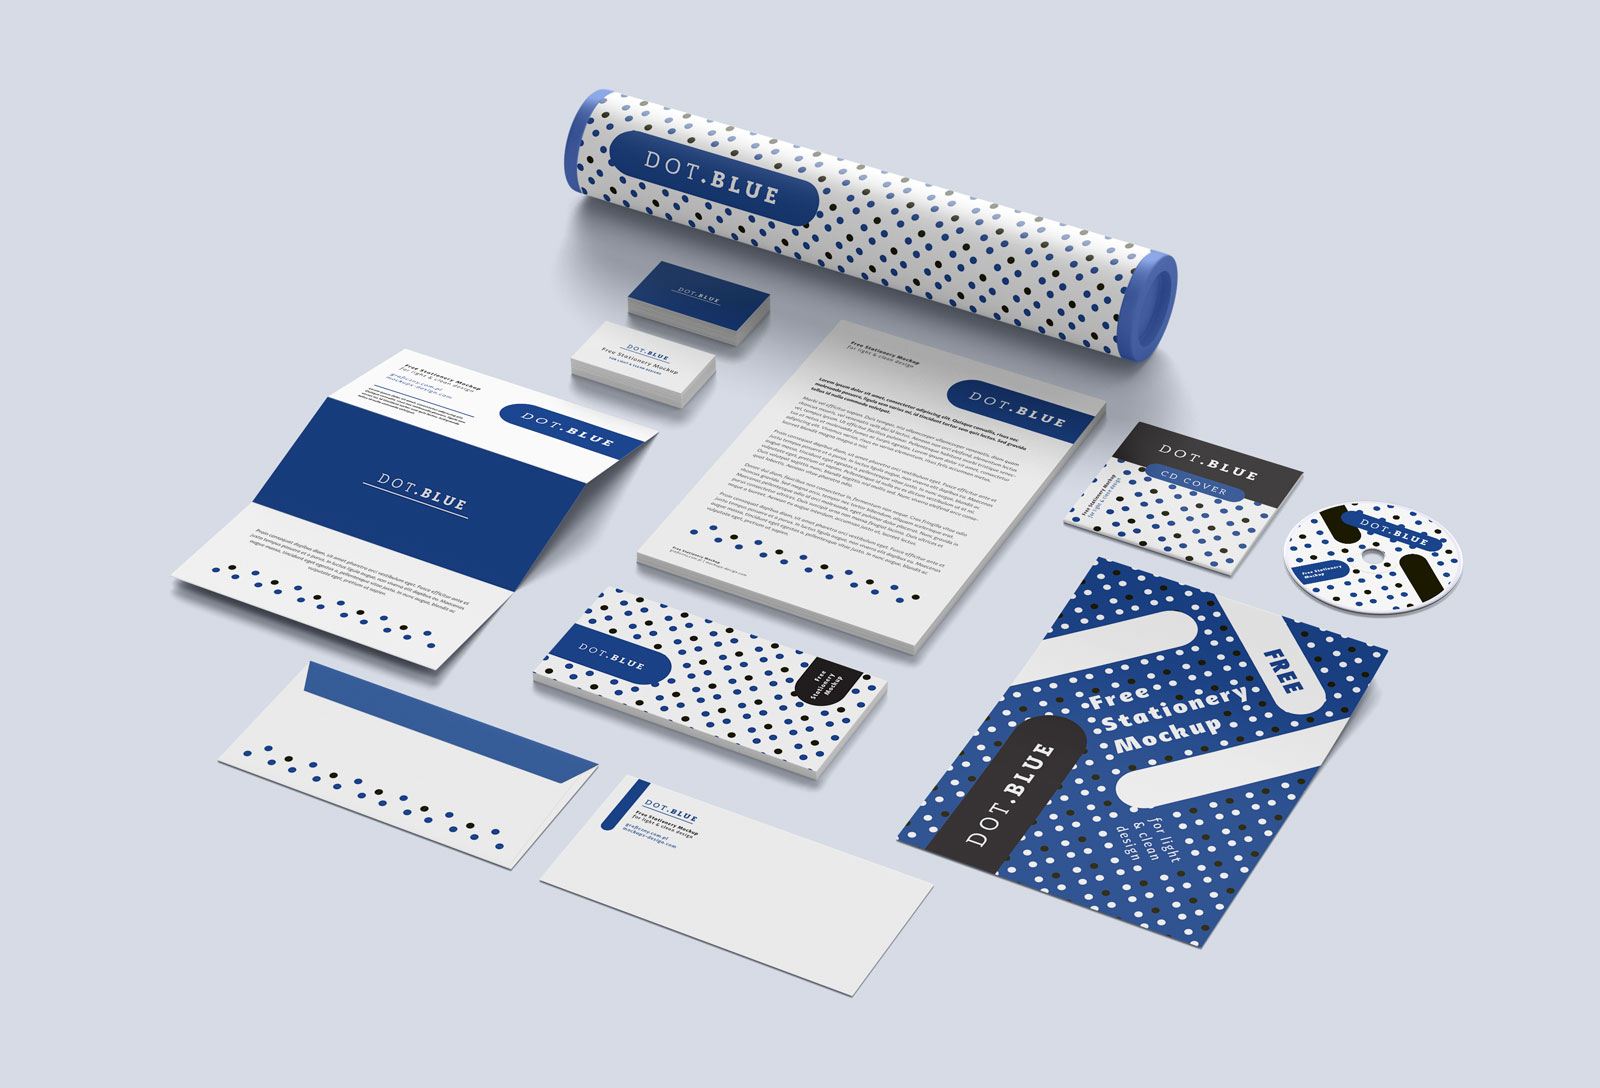 Free Branding Corporate Identity Stationery Mockup Psd